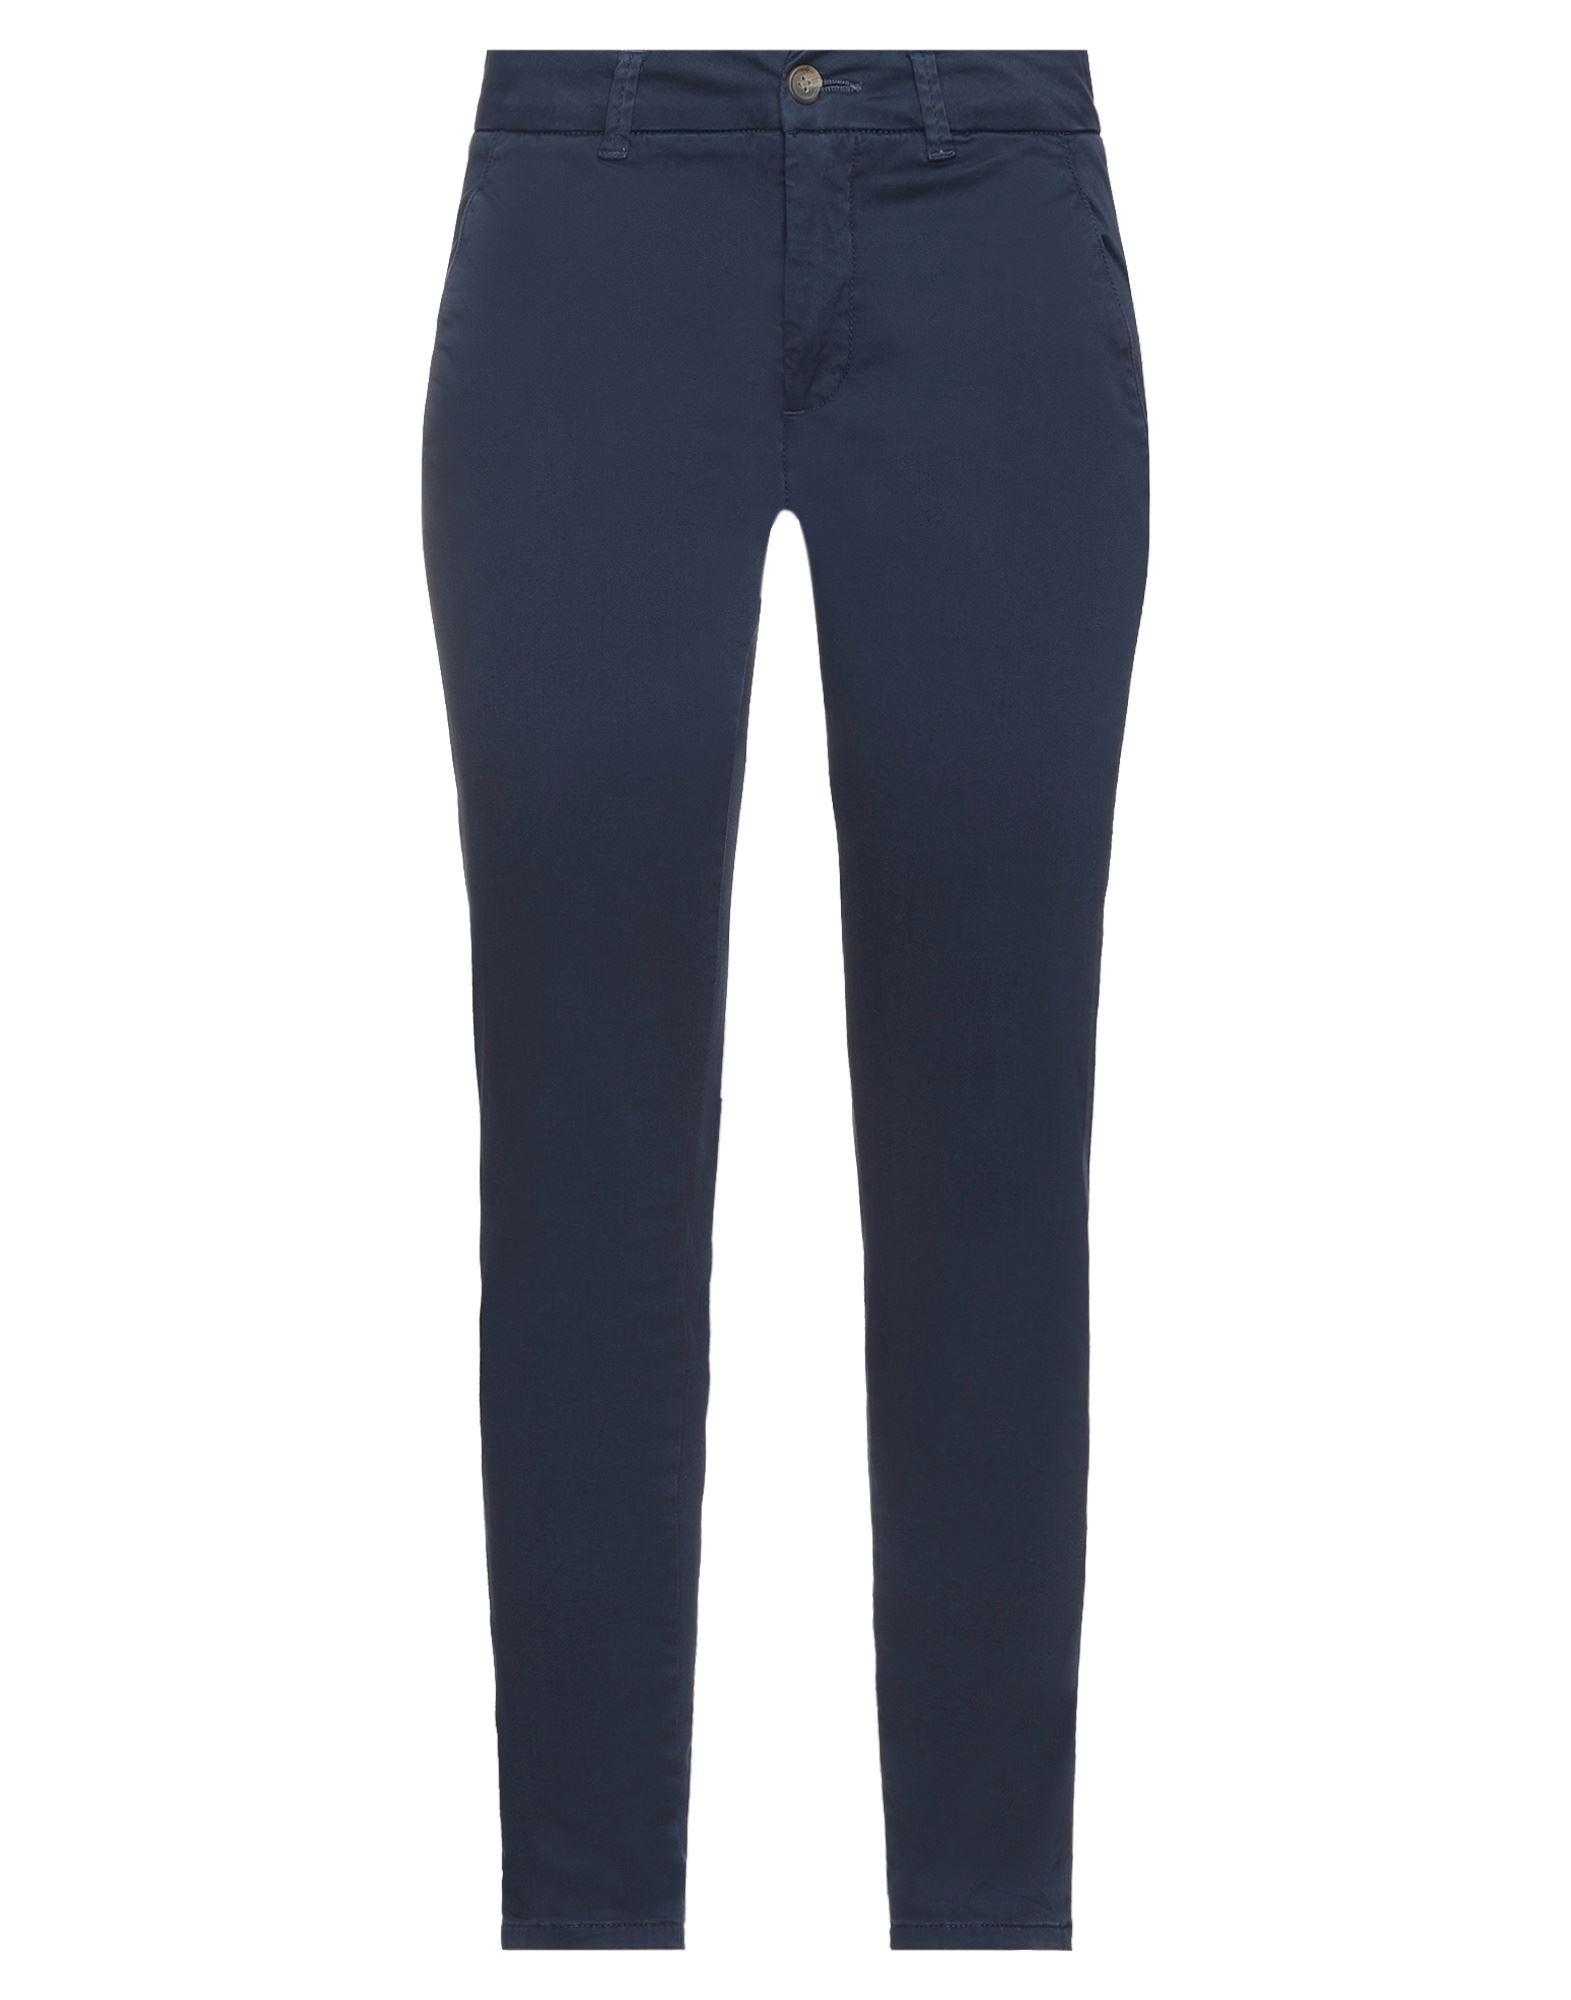 Ab/soul Casual Pants In Dark Blue